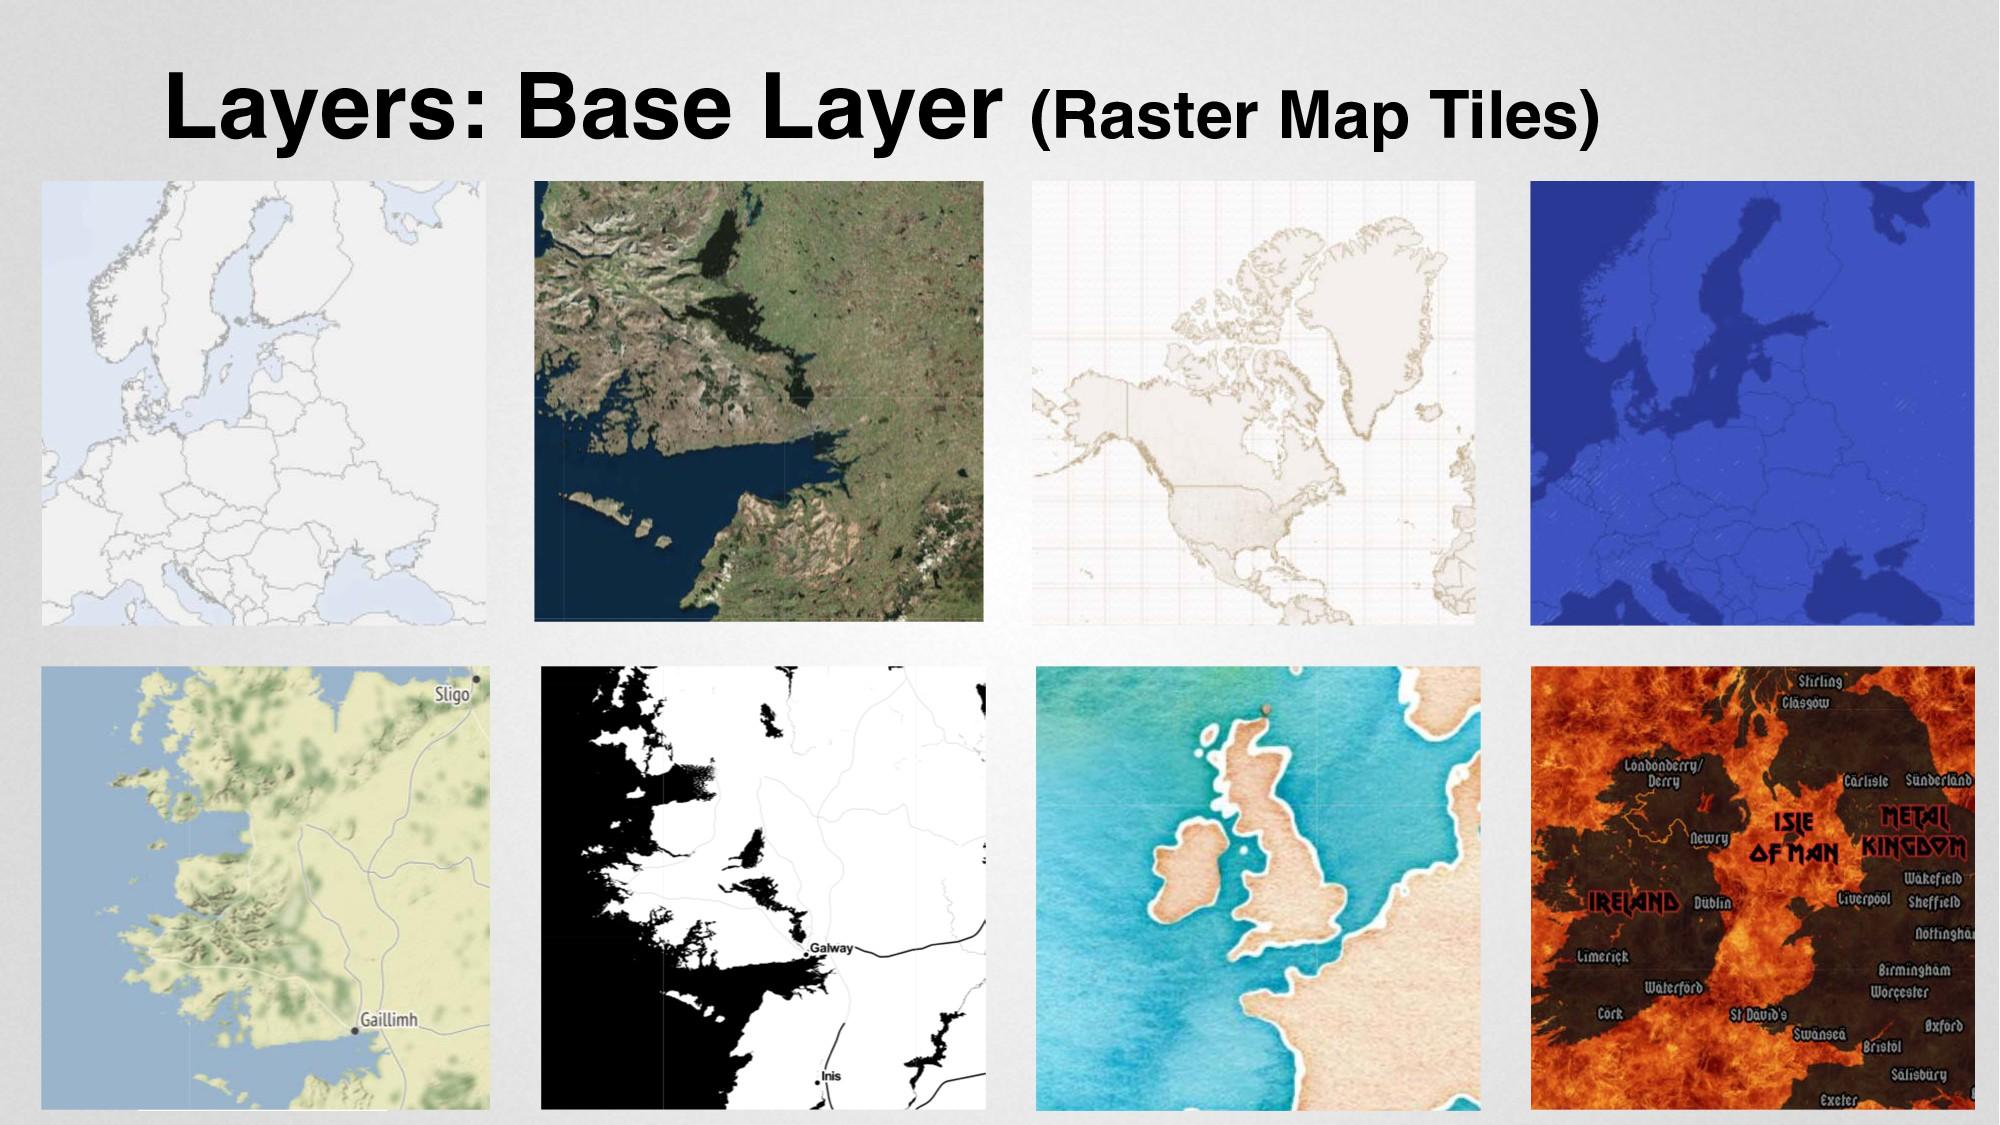 Layers: Base Layer (Raster Map Tiles)